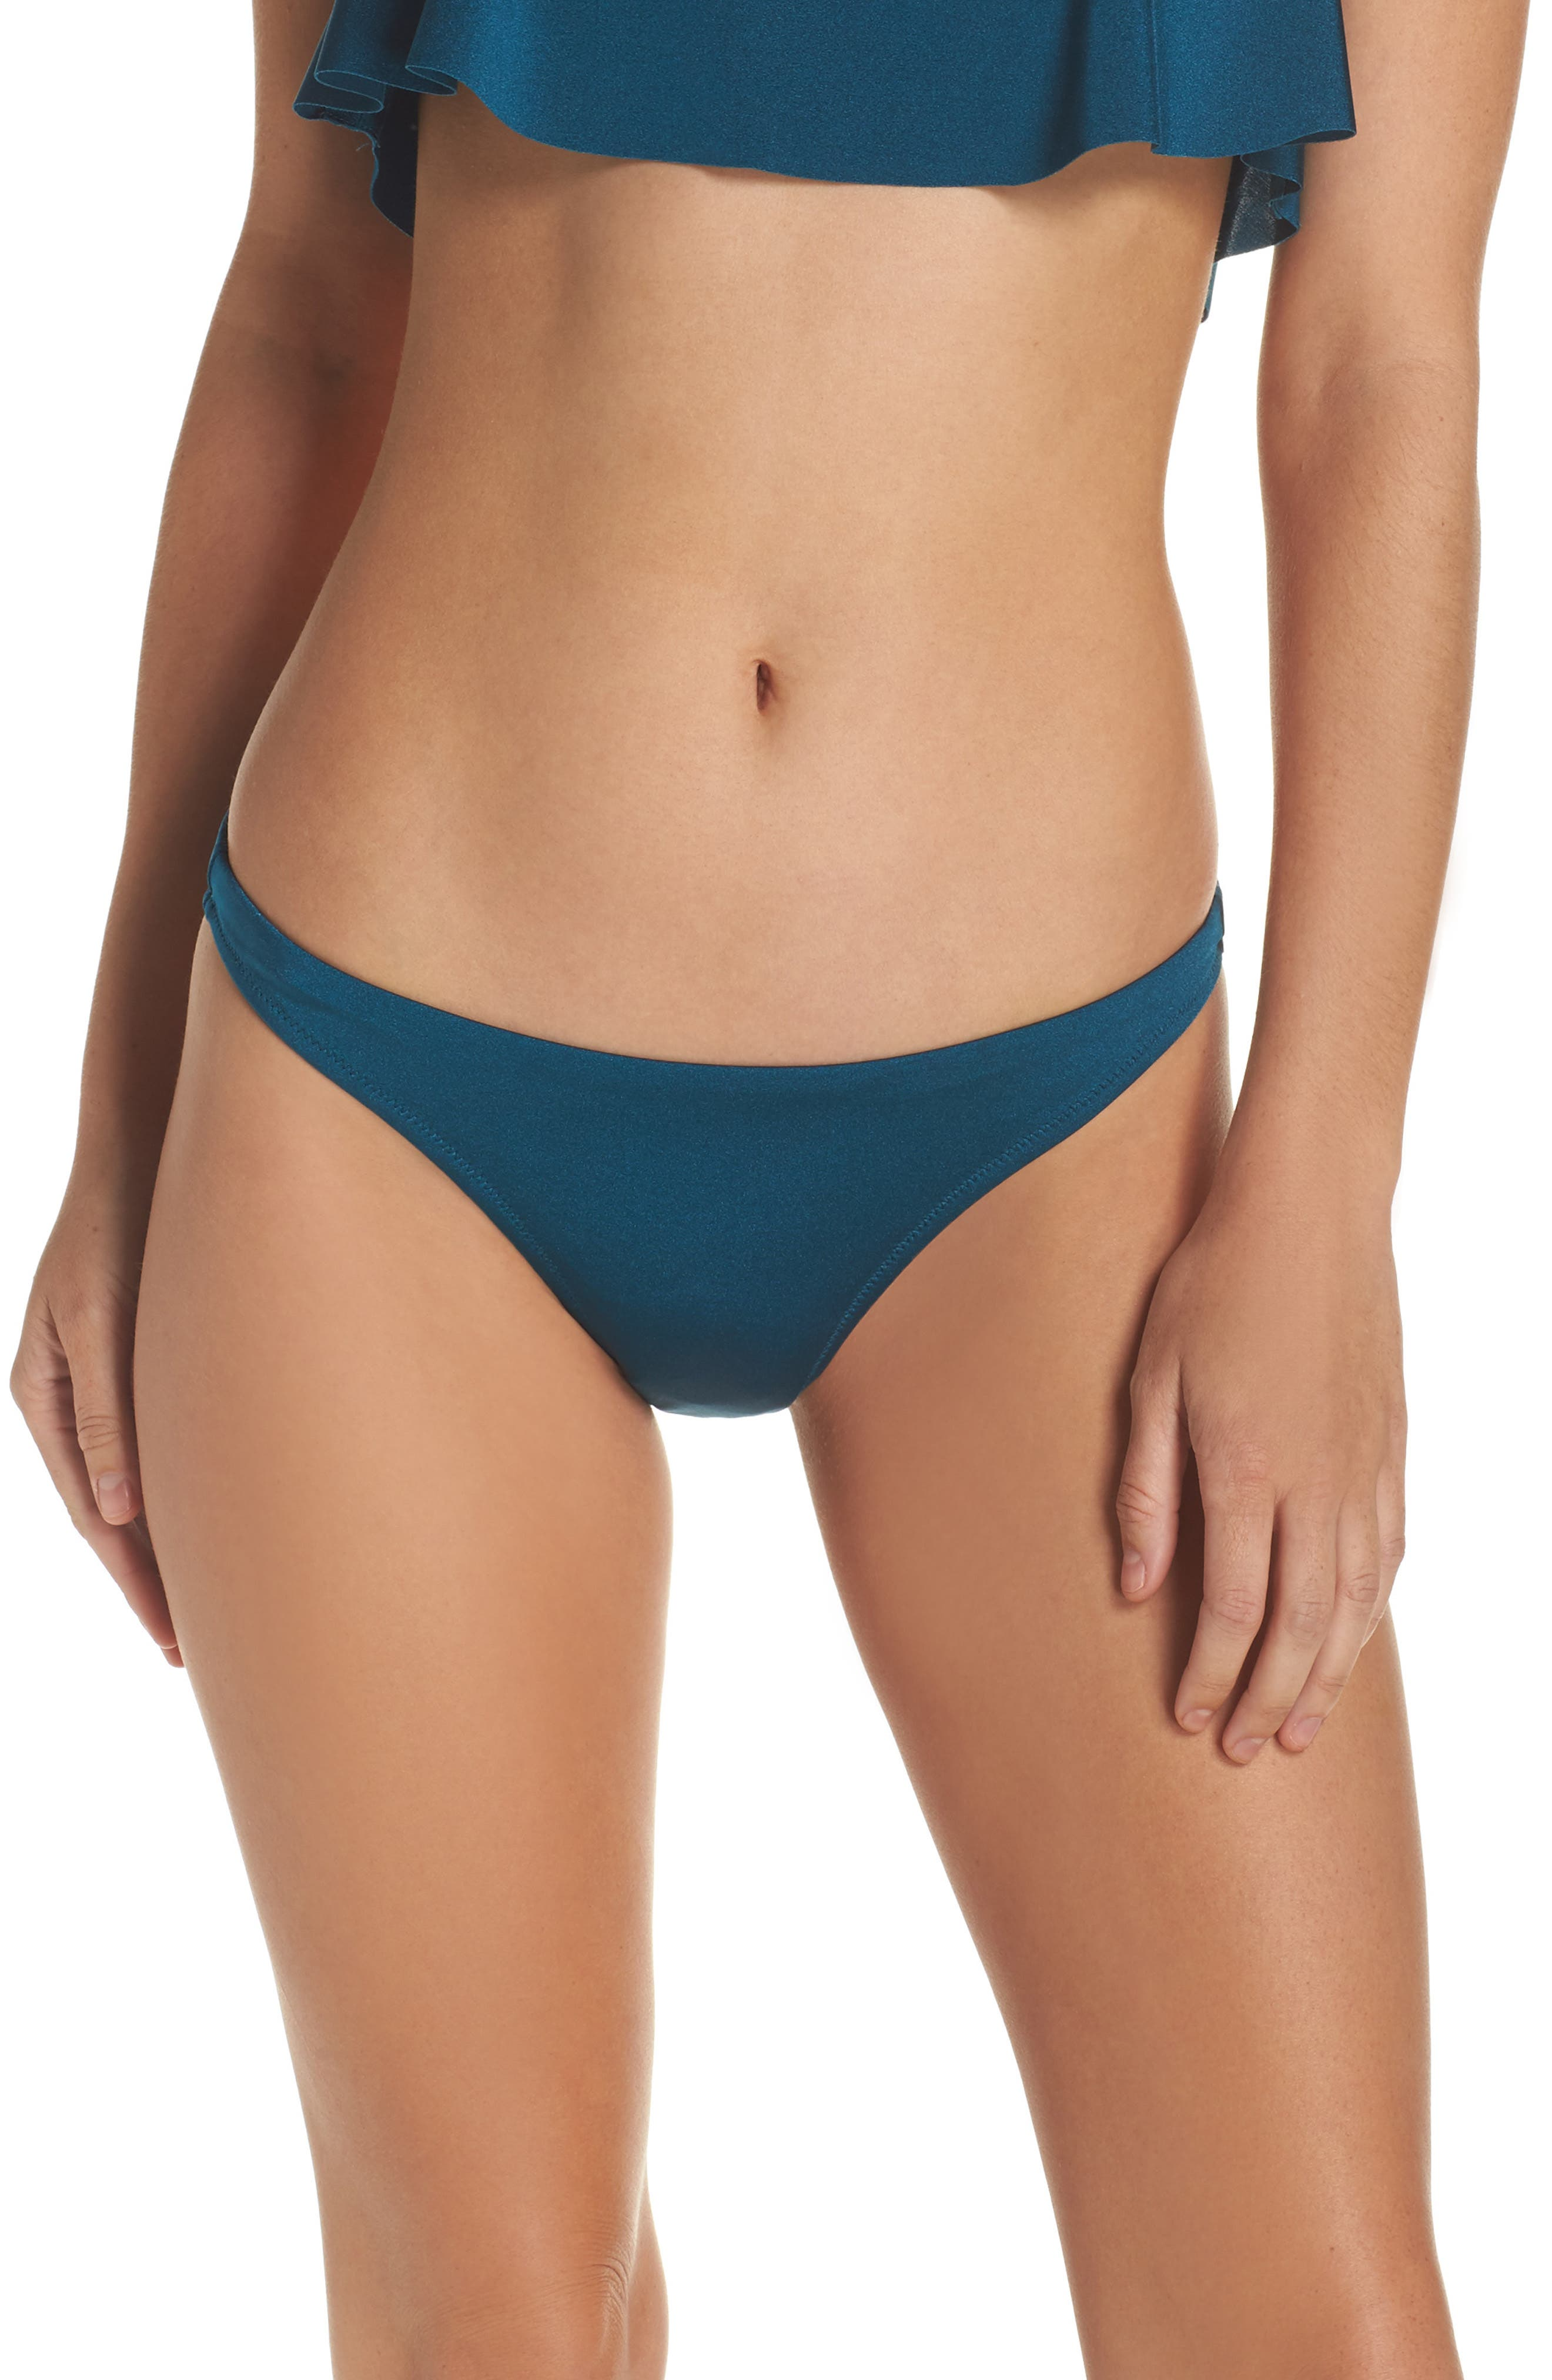 St. Lucia Bikini Bottoms,                         Main,                         color, 445